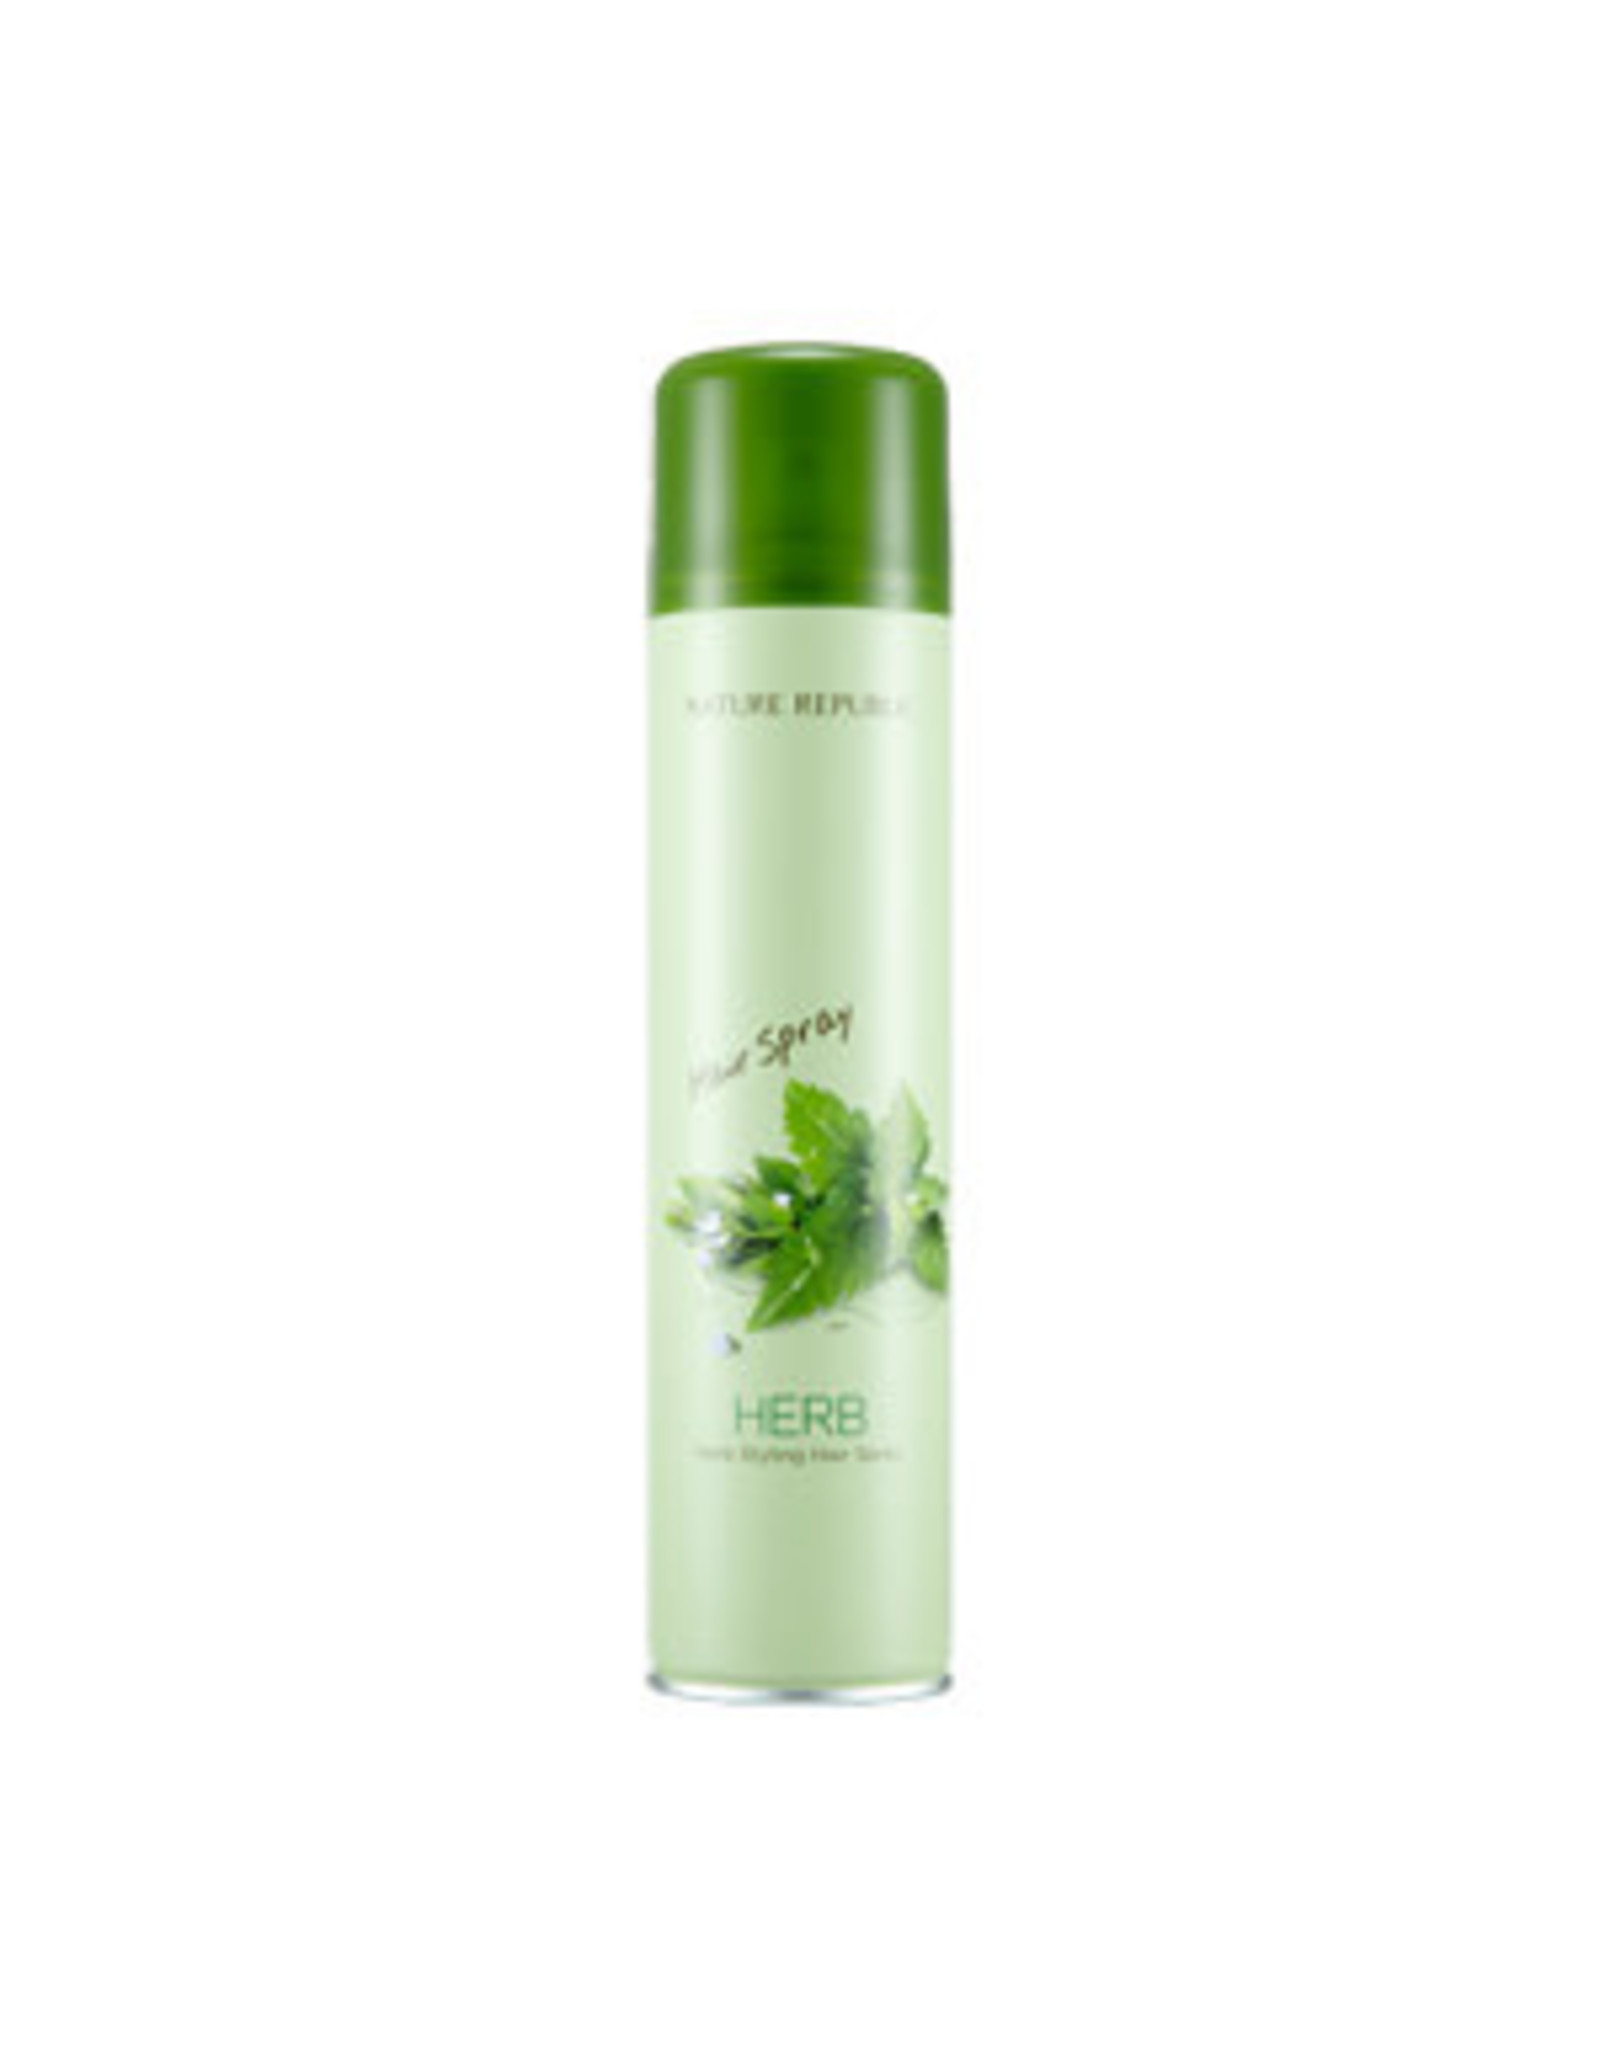 Herb Styling Hair Spray